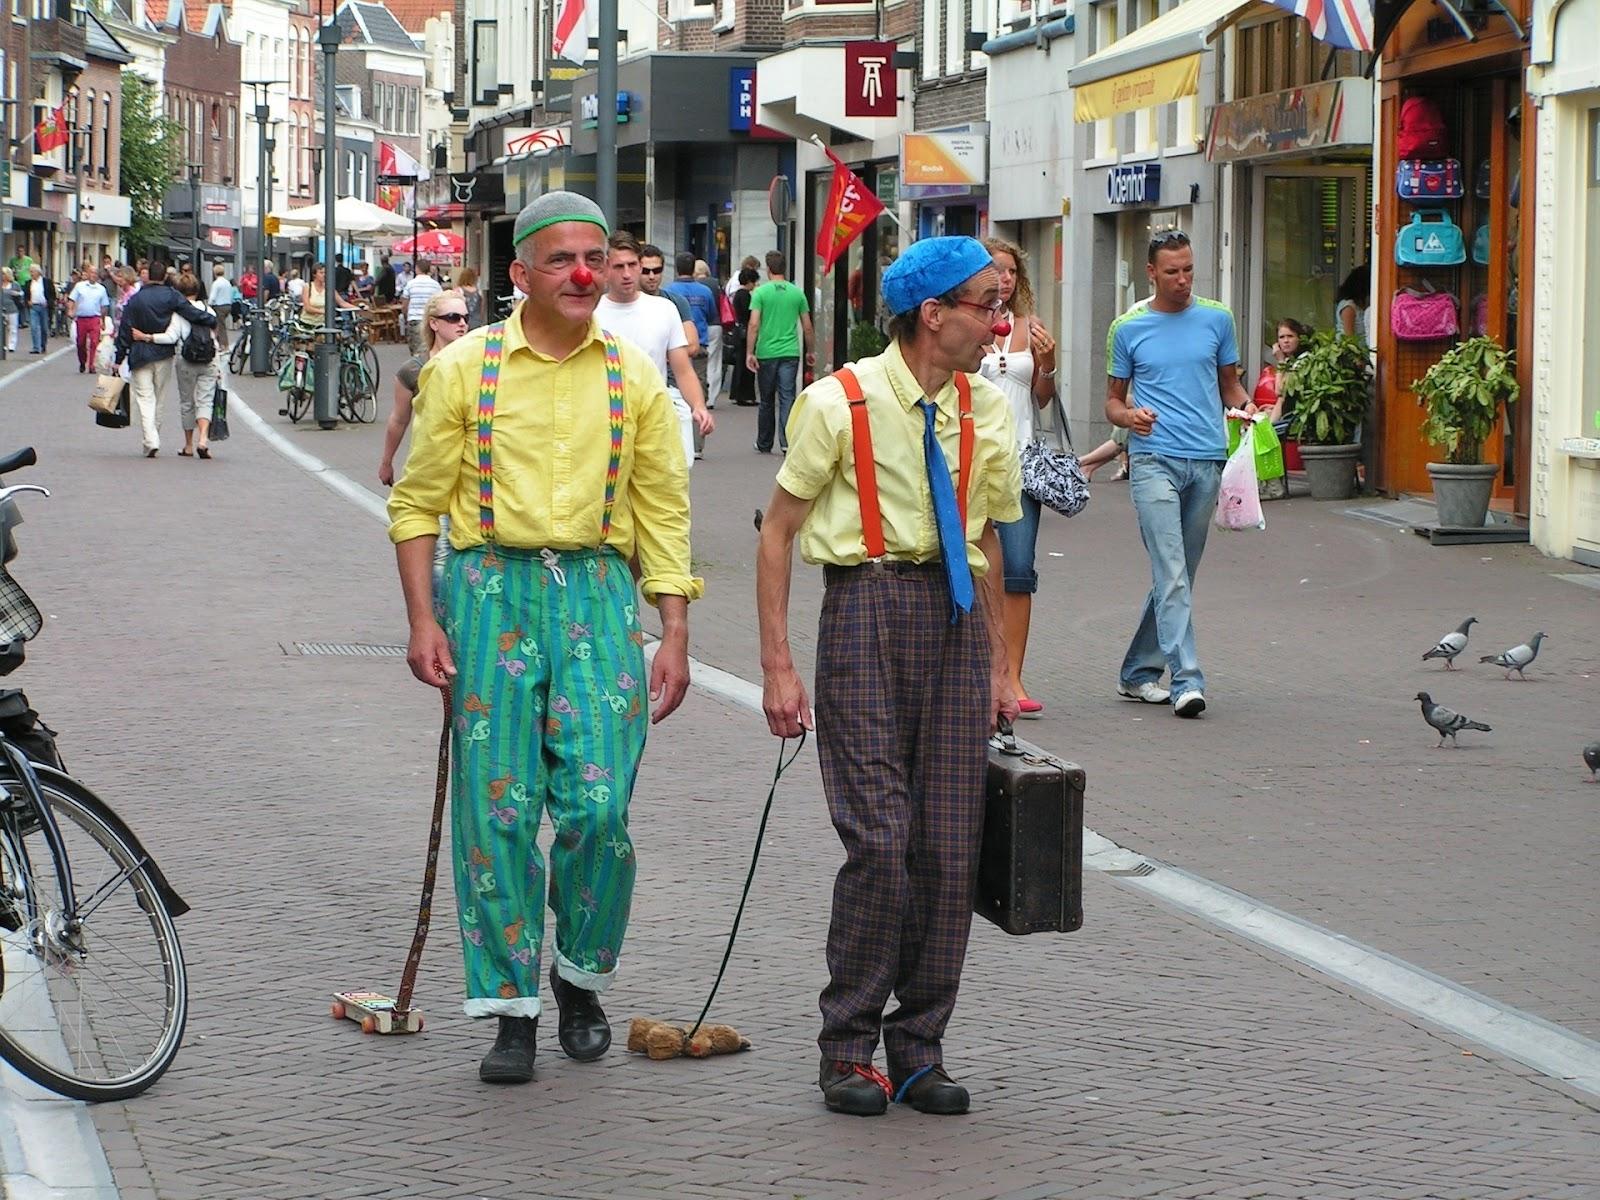 clowns-1517788_1920.jpg